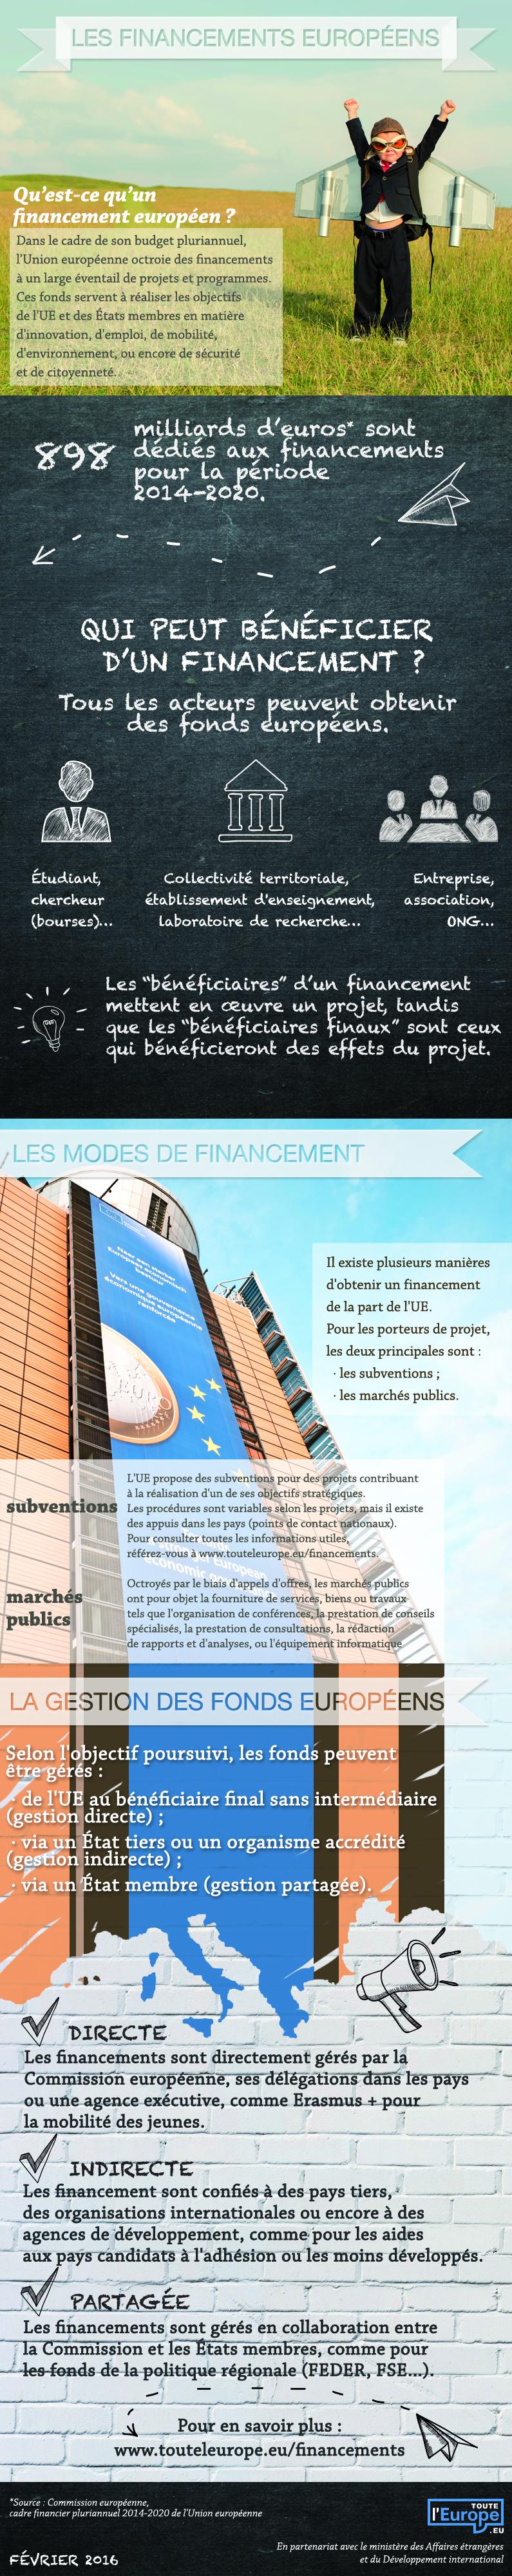 dataviz_financements